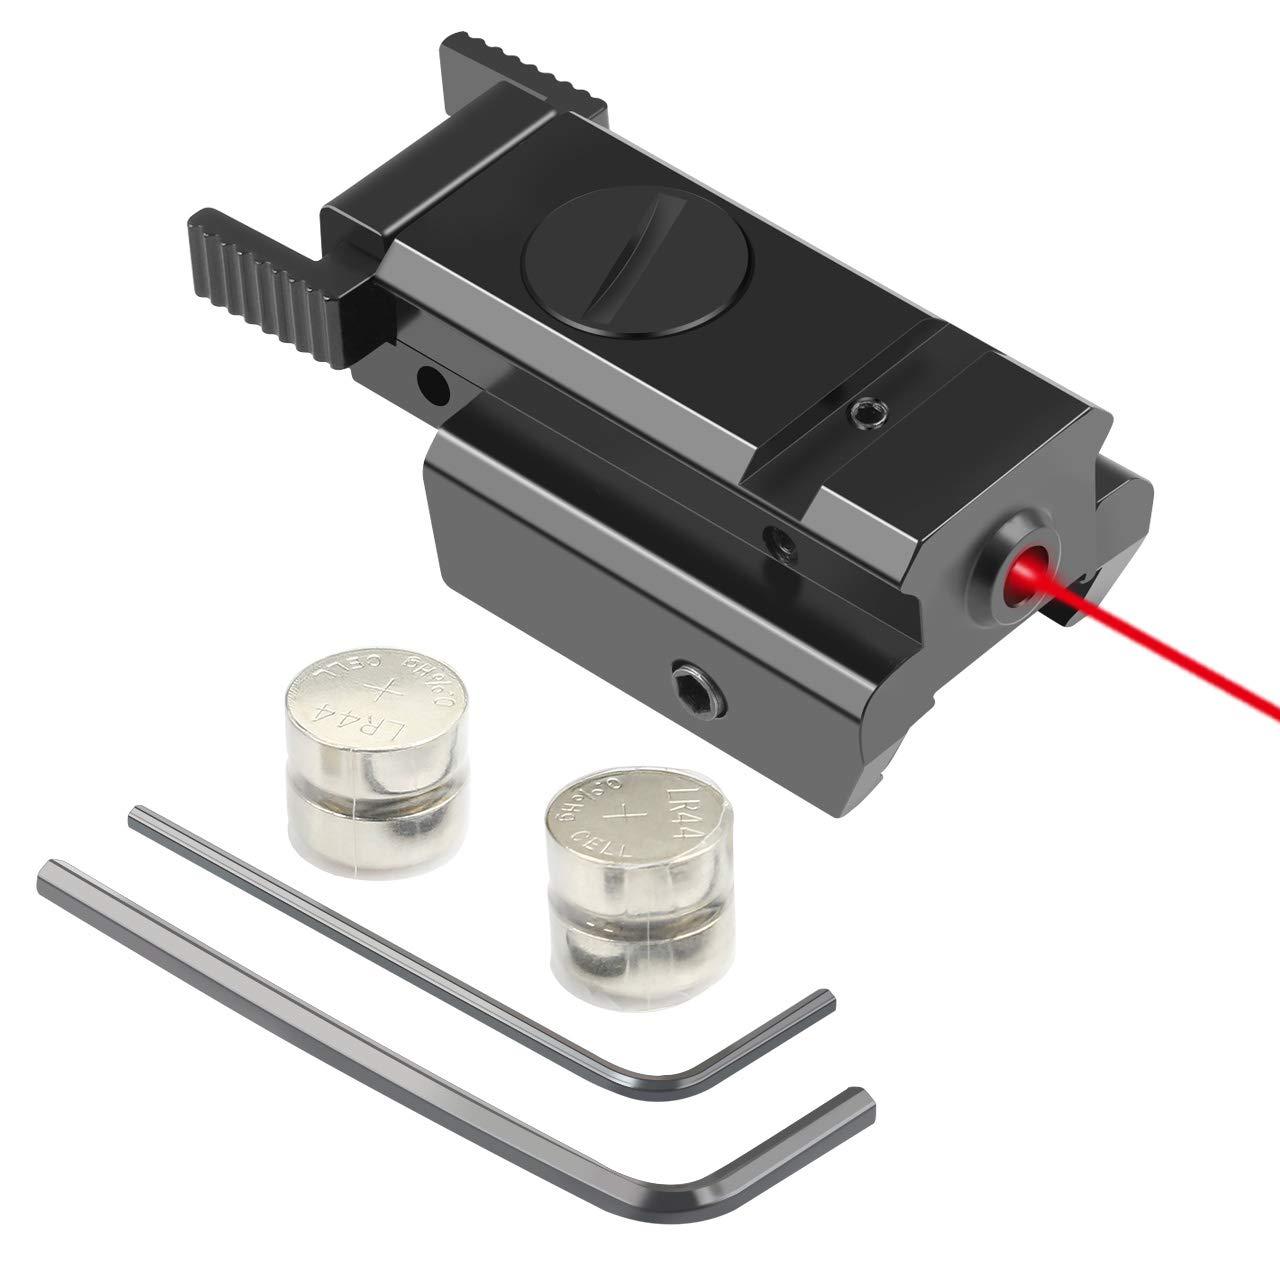 Twod Red Dot Laser Sight Scope 20mm Standard Weaver/Picatinny Rail for Pistol Gun Rifle by Twod